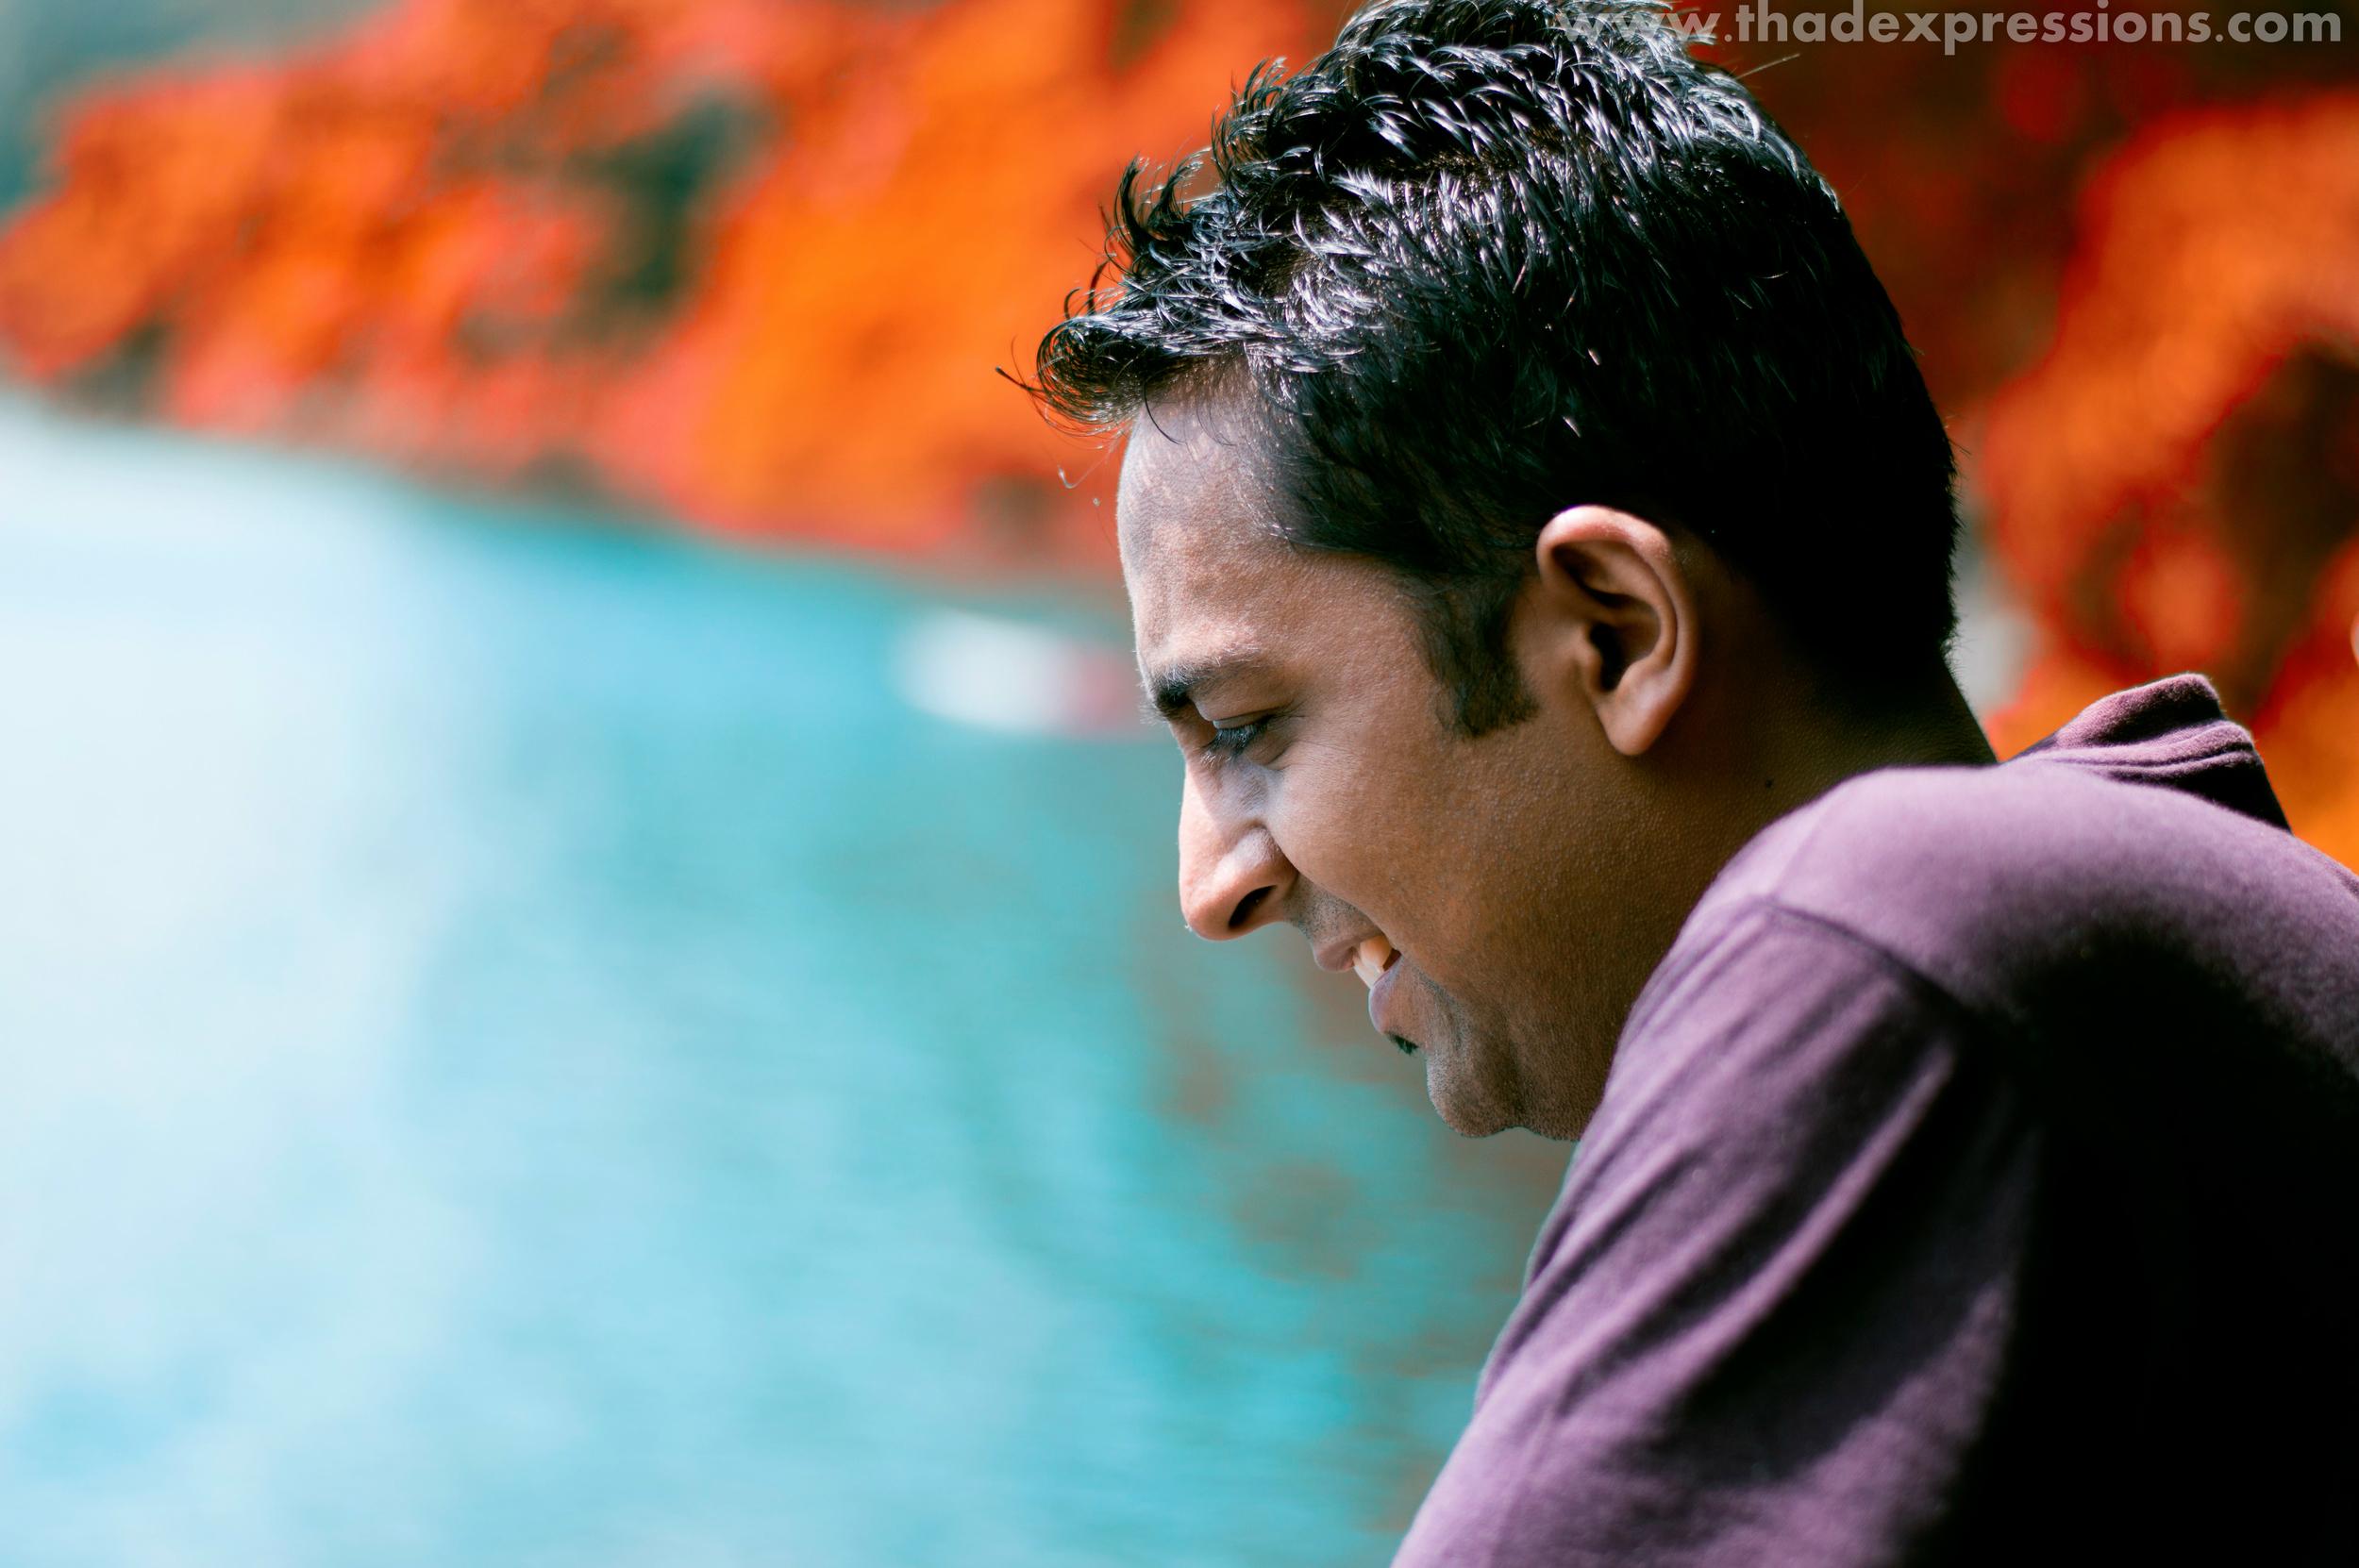 Manish LAKE CHALA - THE SWIM02909.JPG